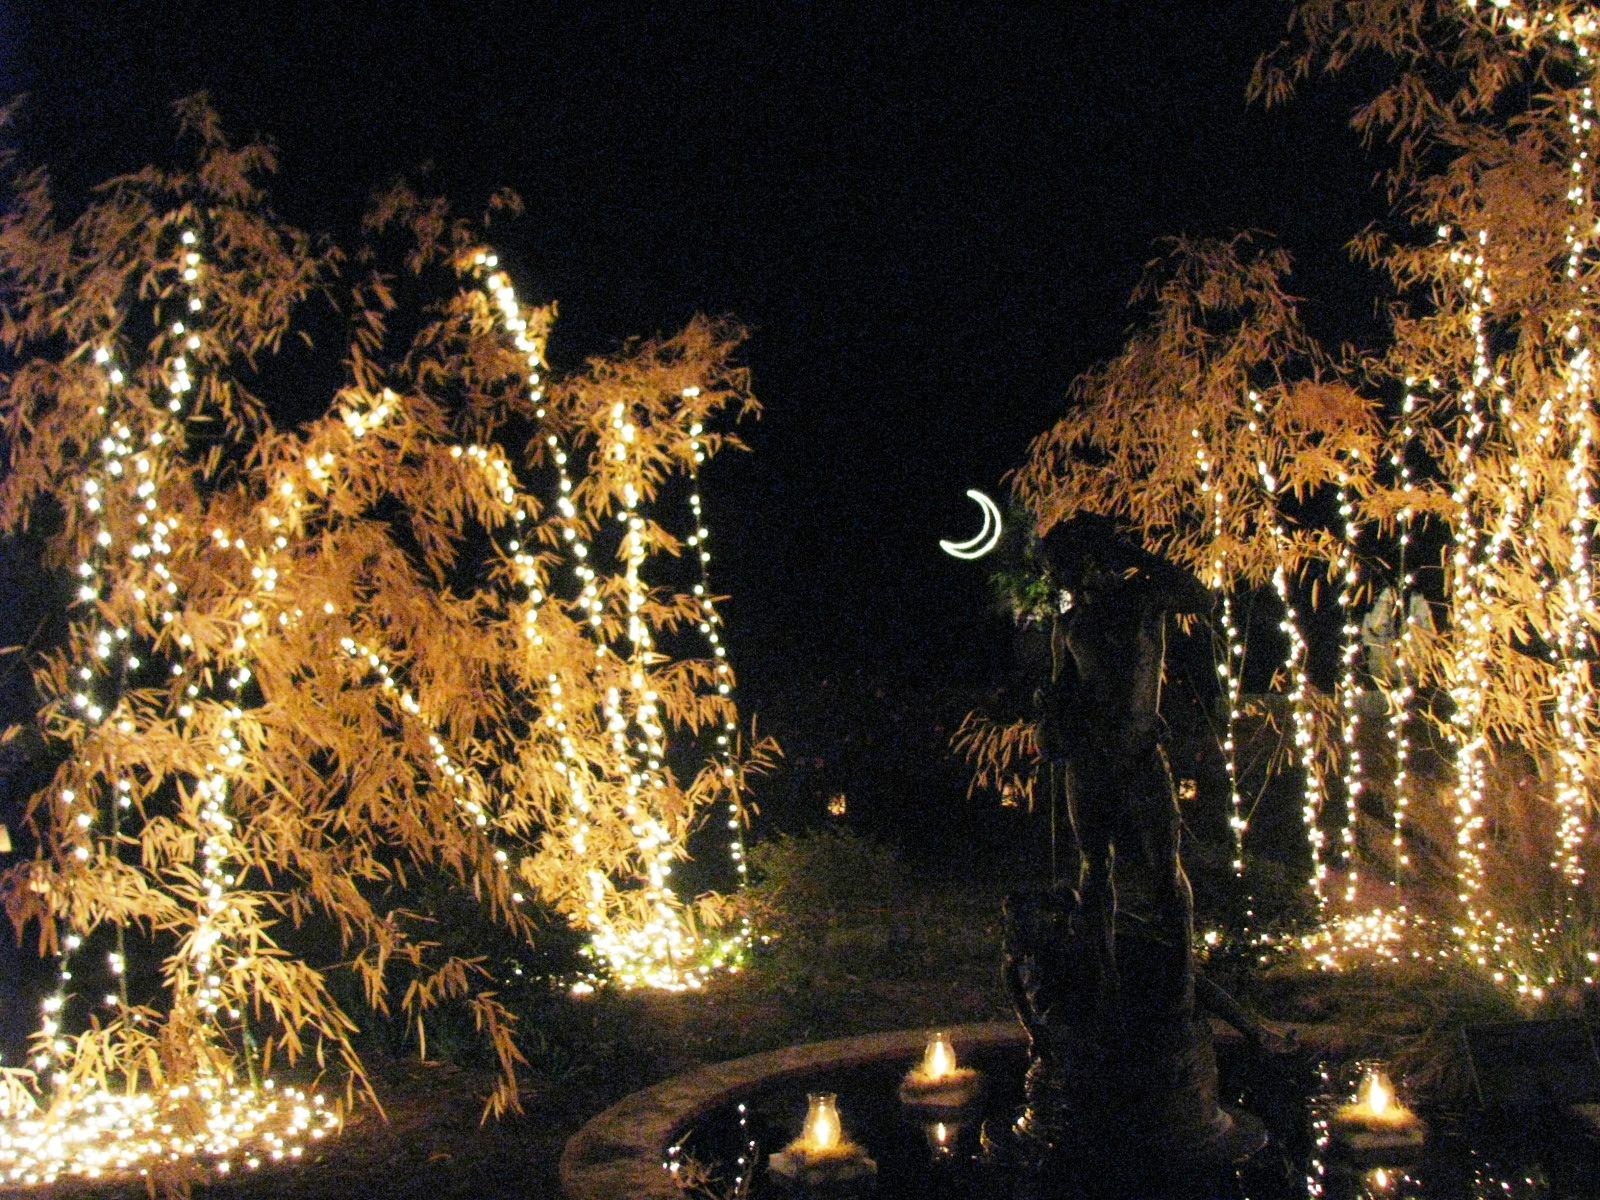 C Campbell 39 S Fine Art Night Of A Thousand Candles At Brookgreen Gardens 12 39 07